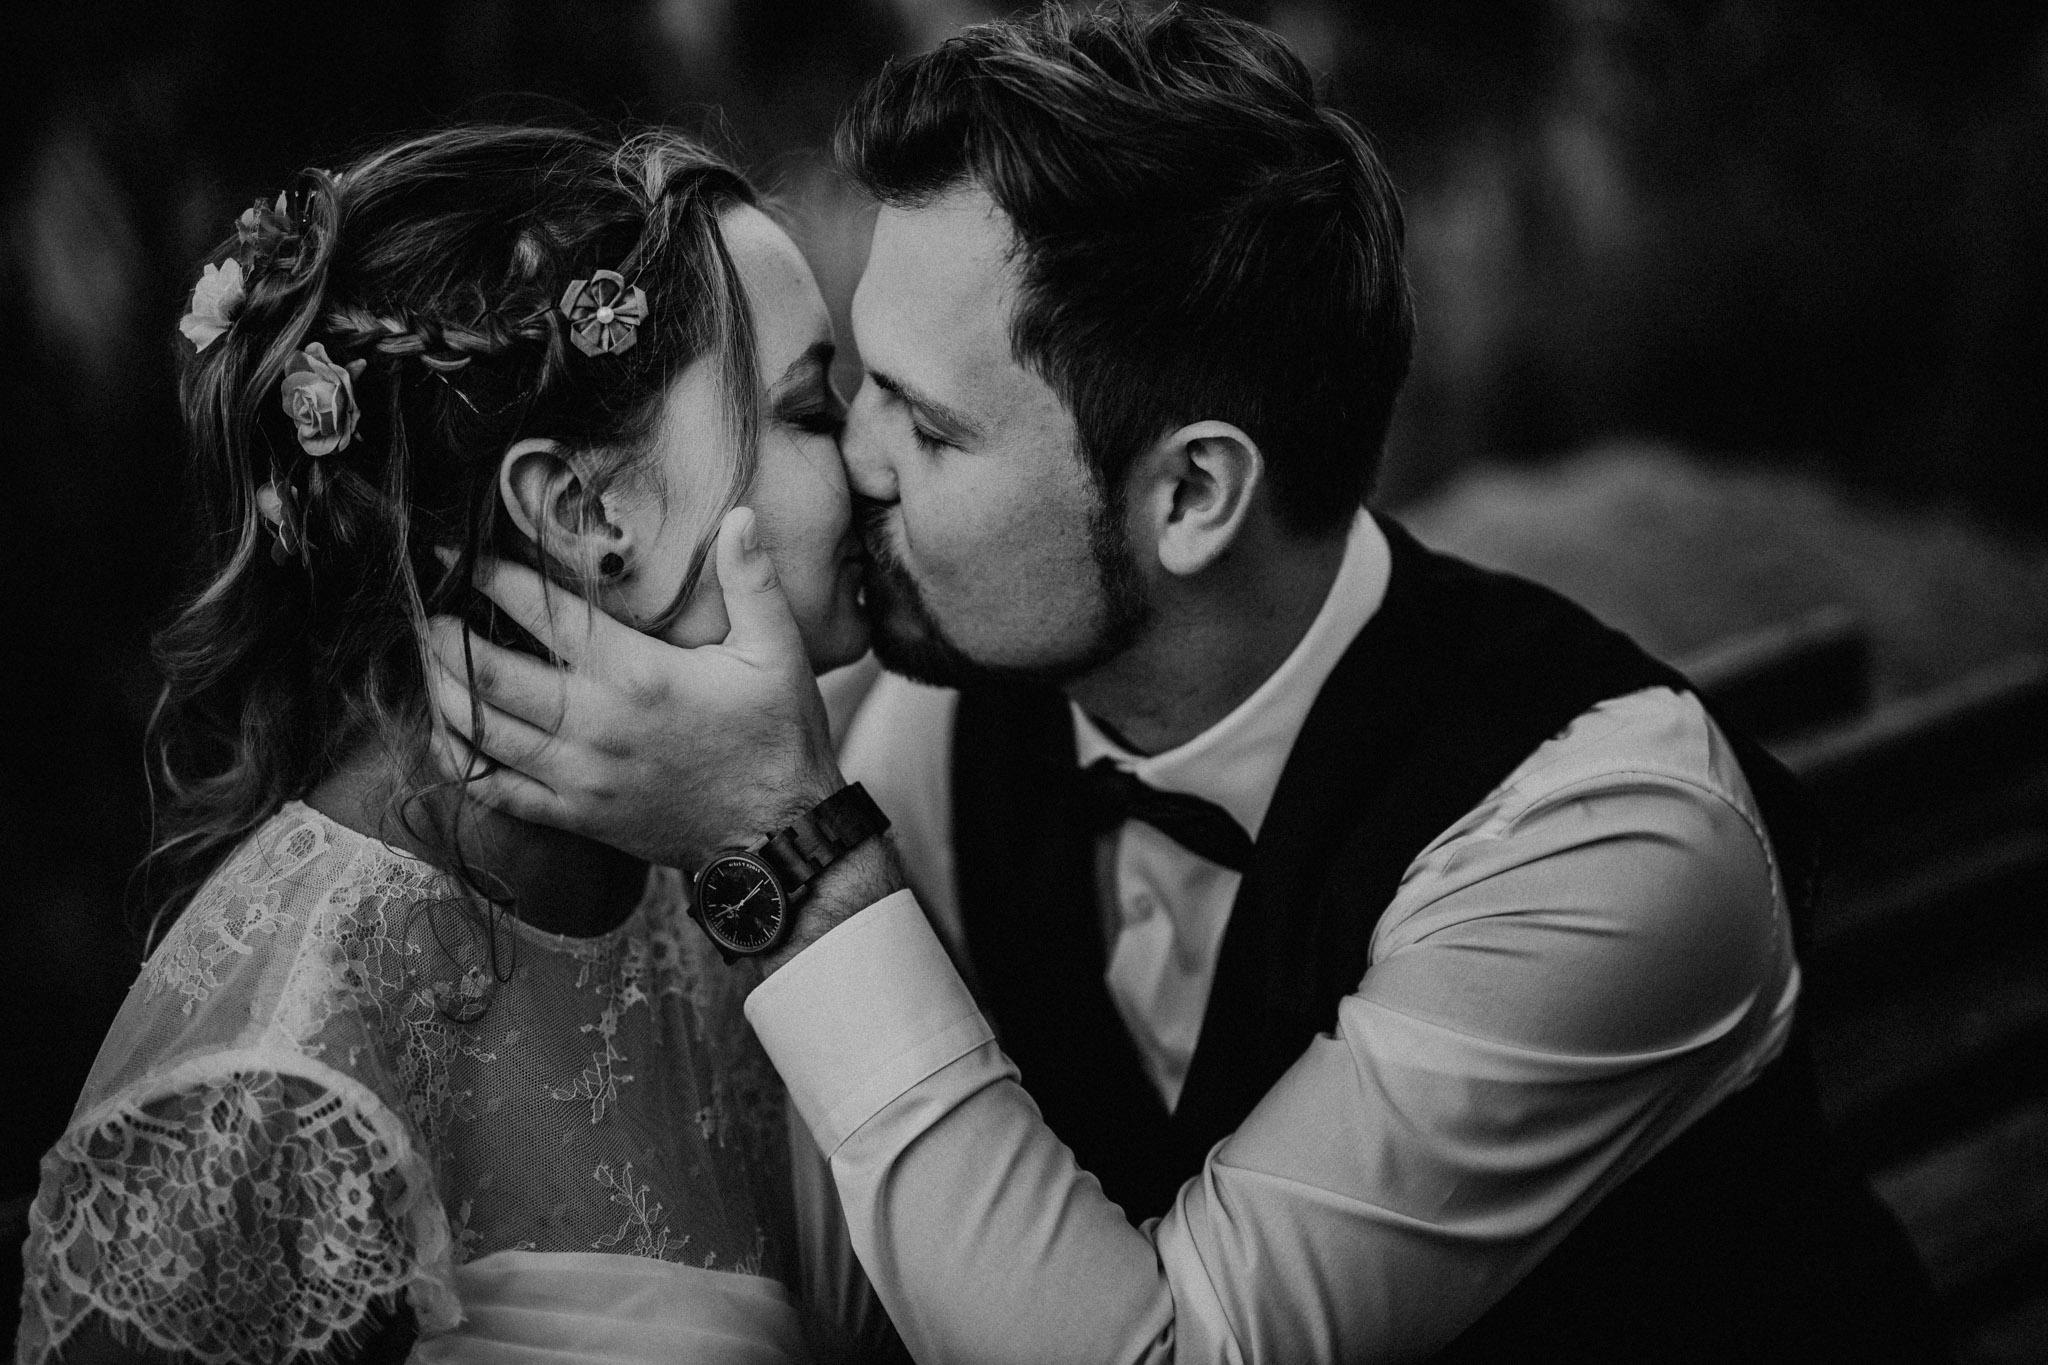 Hochzeit Ilmenau | Haus am See I Couple I Shooting I Wedding I Hochzeit IThüringen Hochzeitsfotografie I Wedding Photography